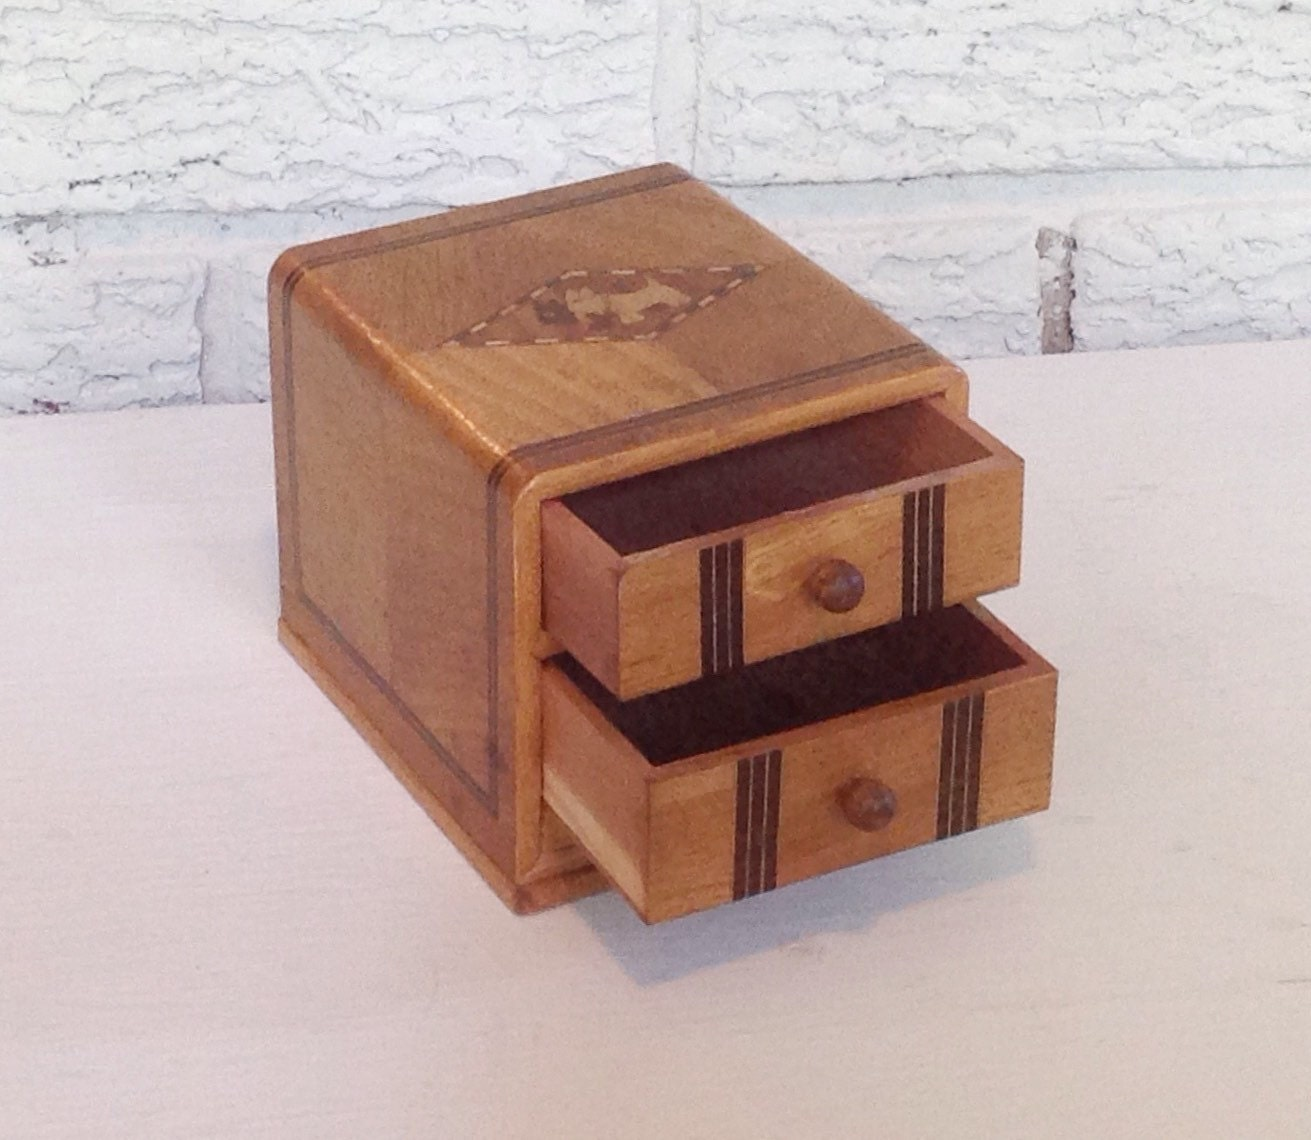 Wooden Decorative Boxes: Scotty Dog Box Decorative Wooden Box Wooden Jewelry Box